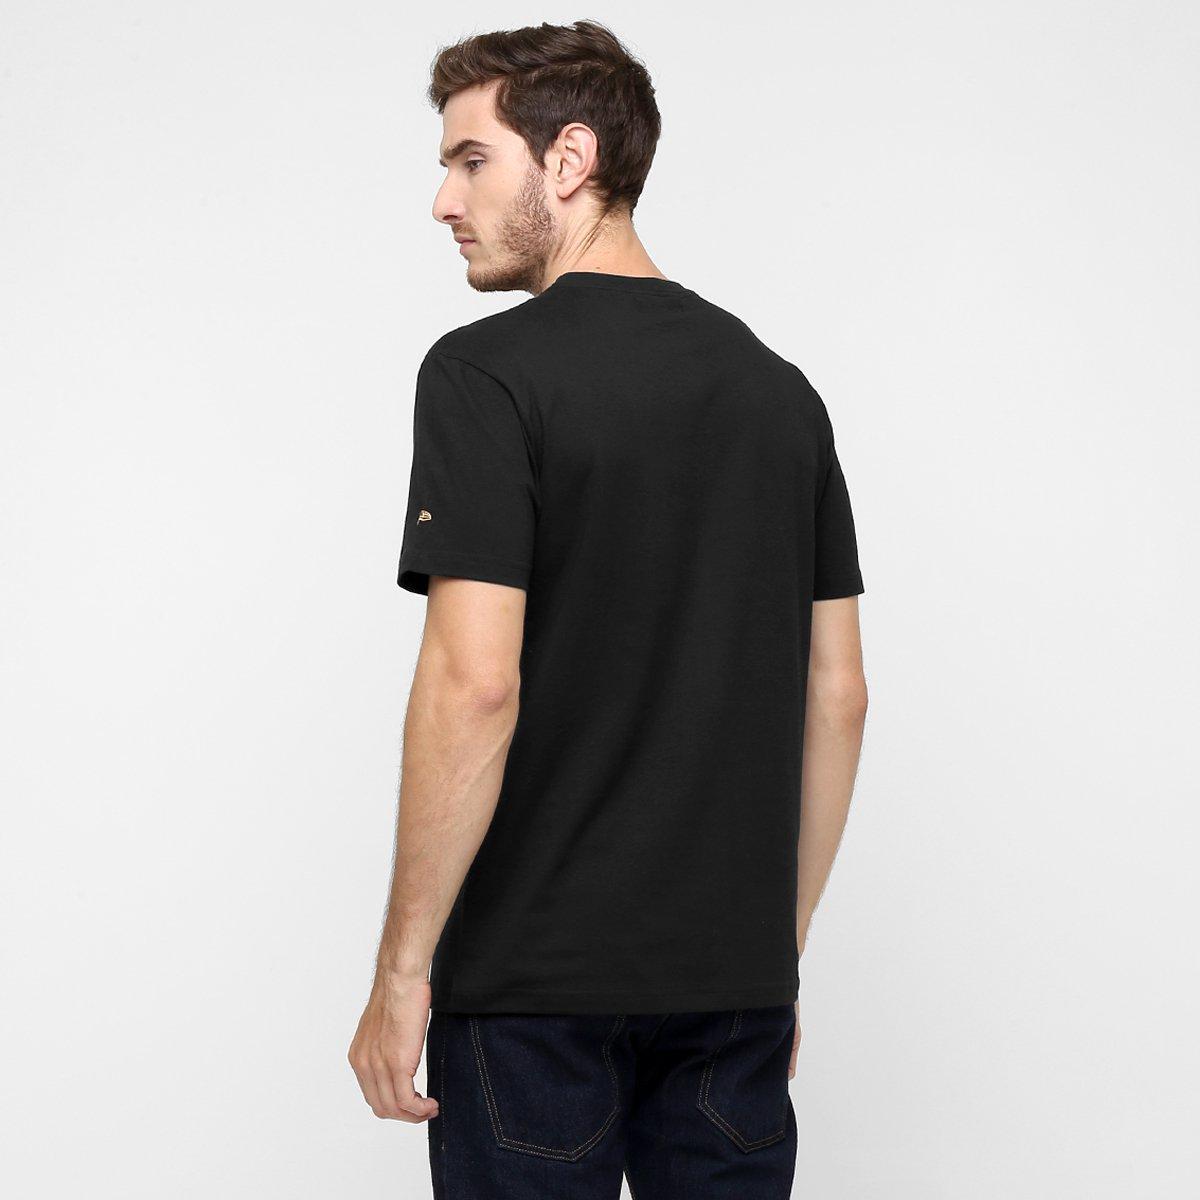 Camiseta New Era MLB Nac Gold 10 Chicago Cubs - Compre Agora  96ee4f45e4e